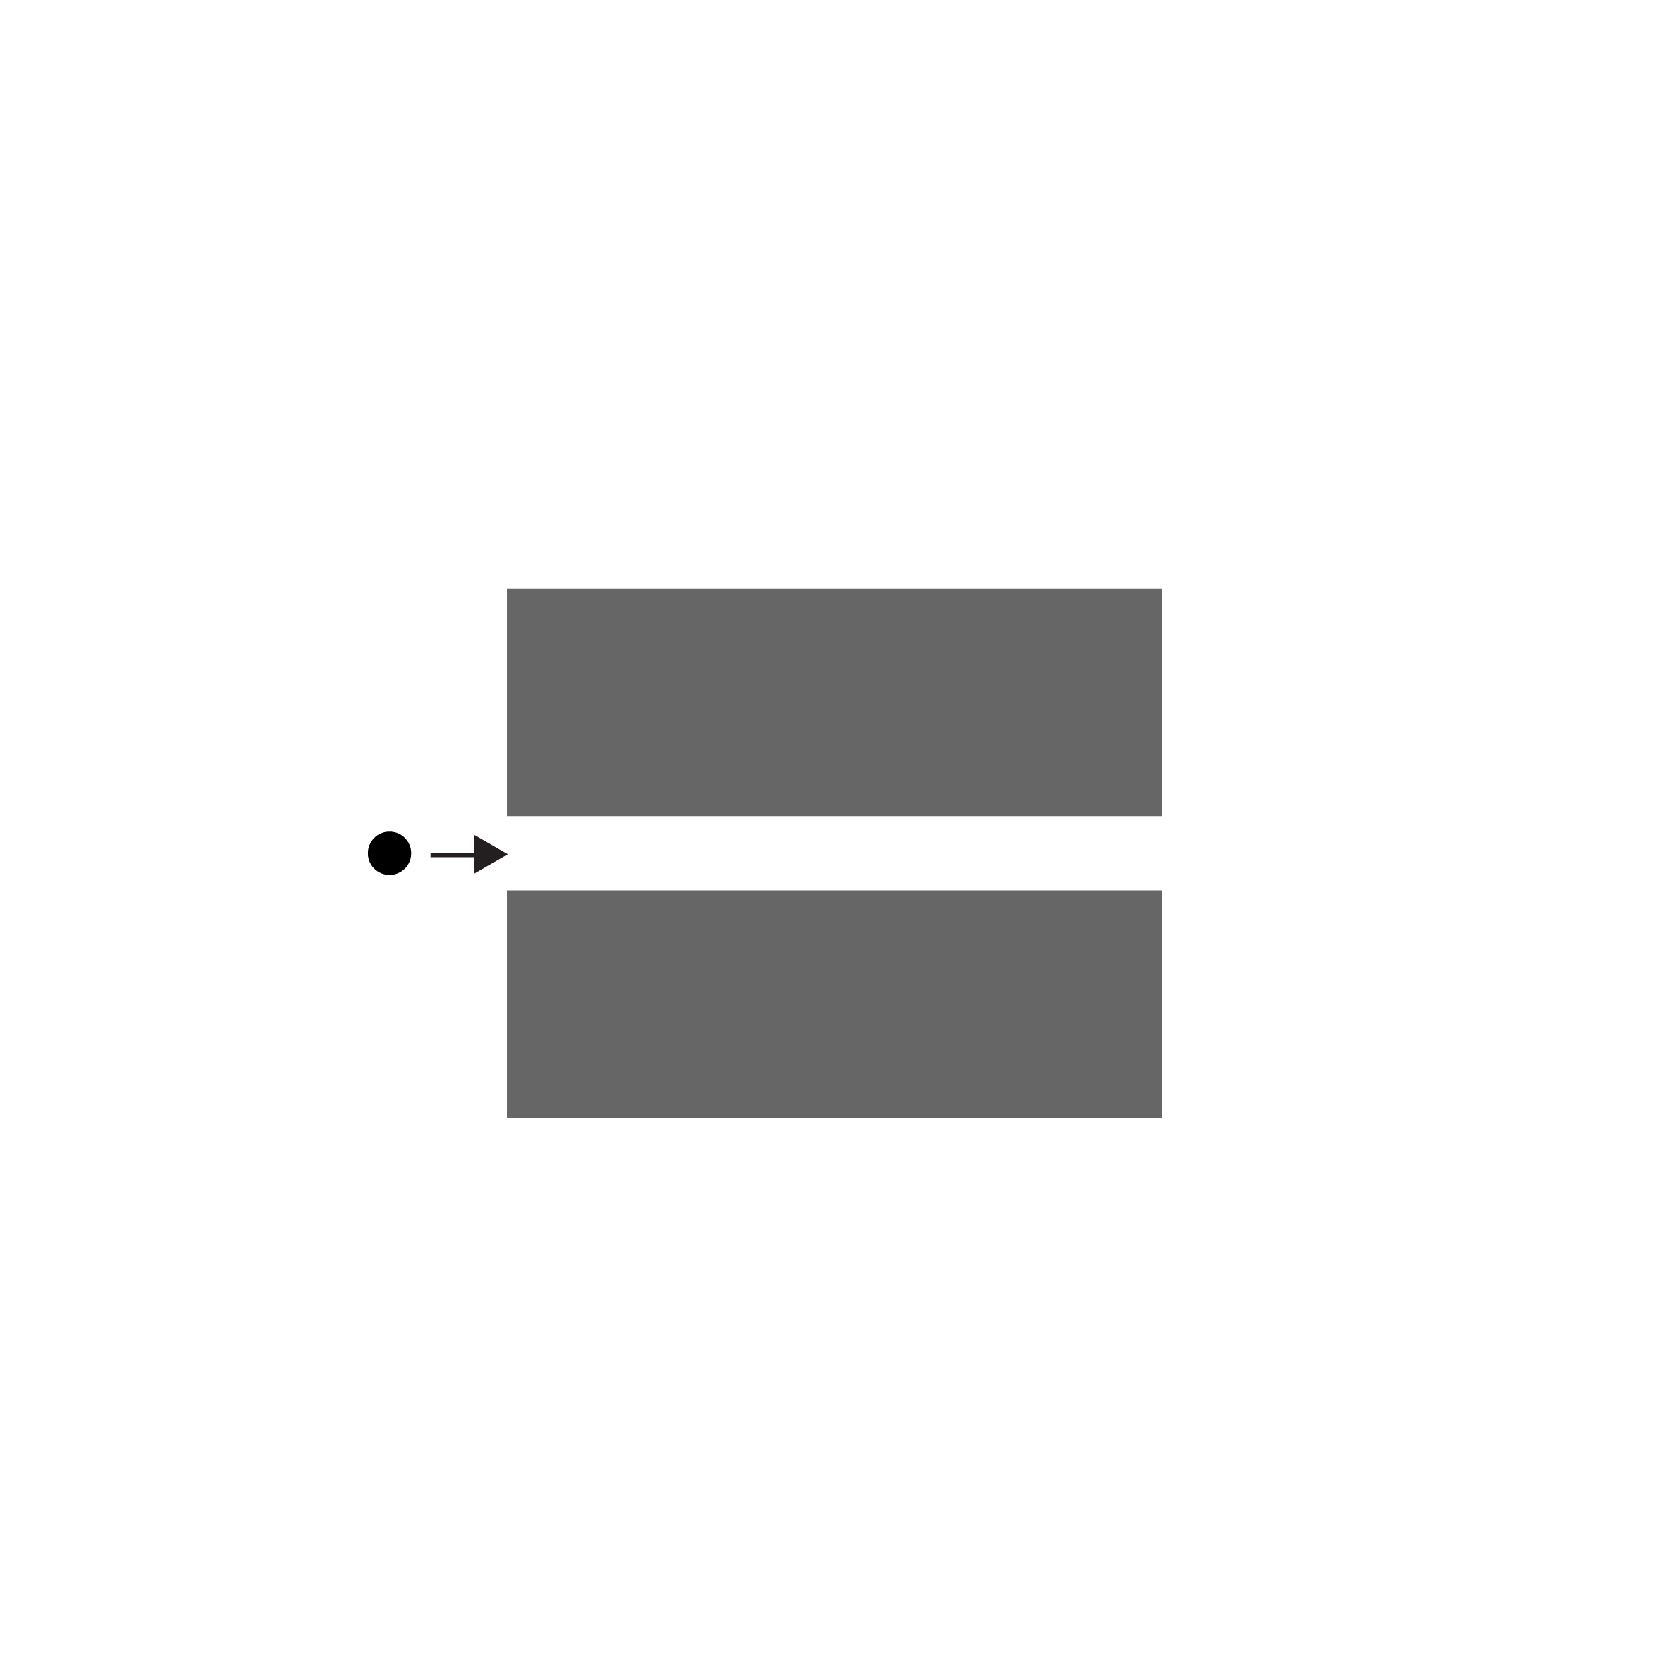 Bitflow-studio-logo-scientific-project-2dsipc-concept